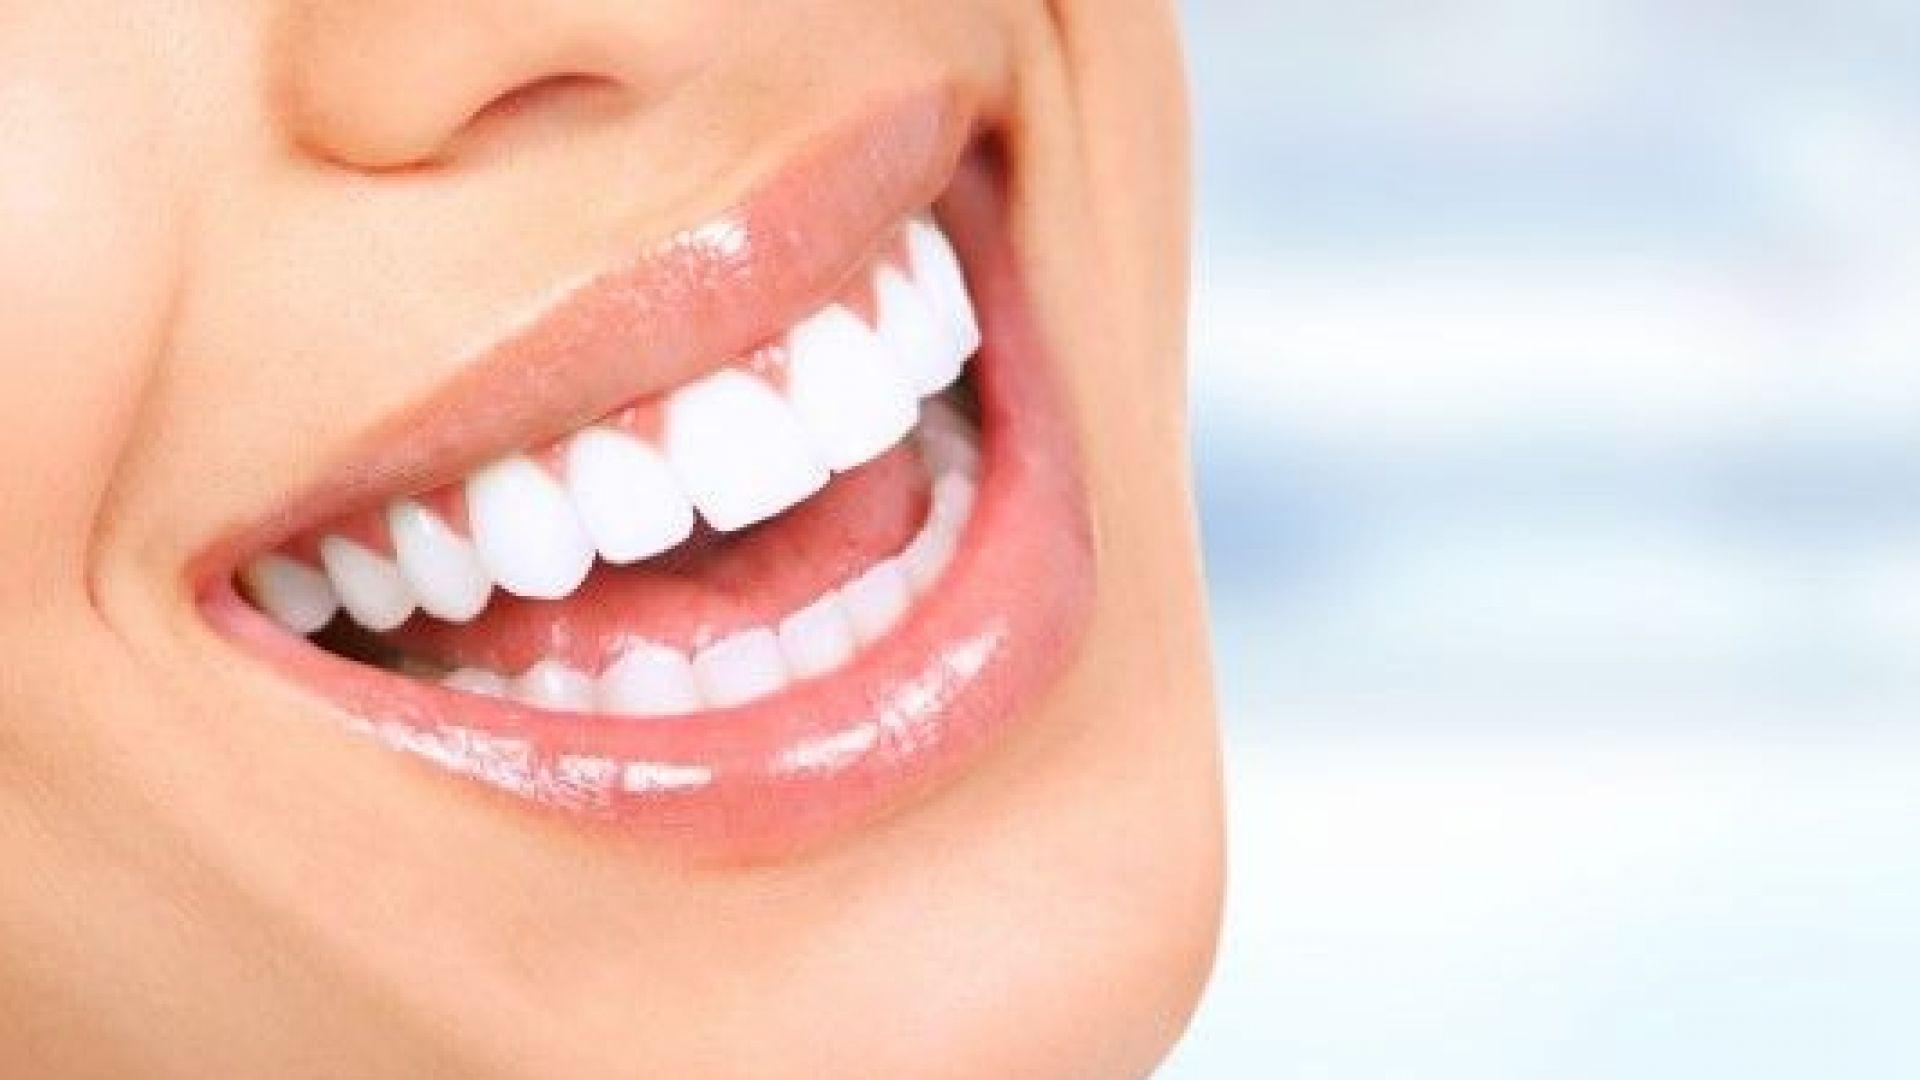 750 000 души у нас нямат нито един зъб